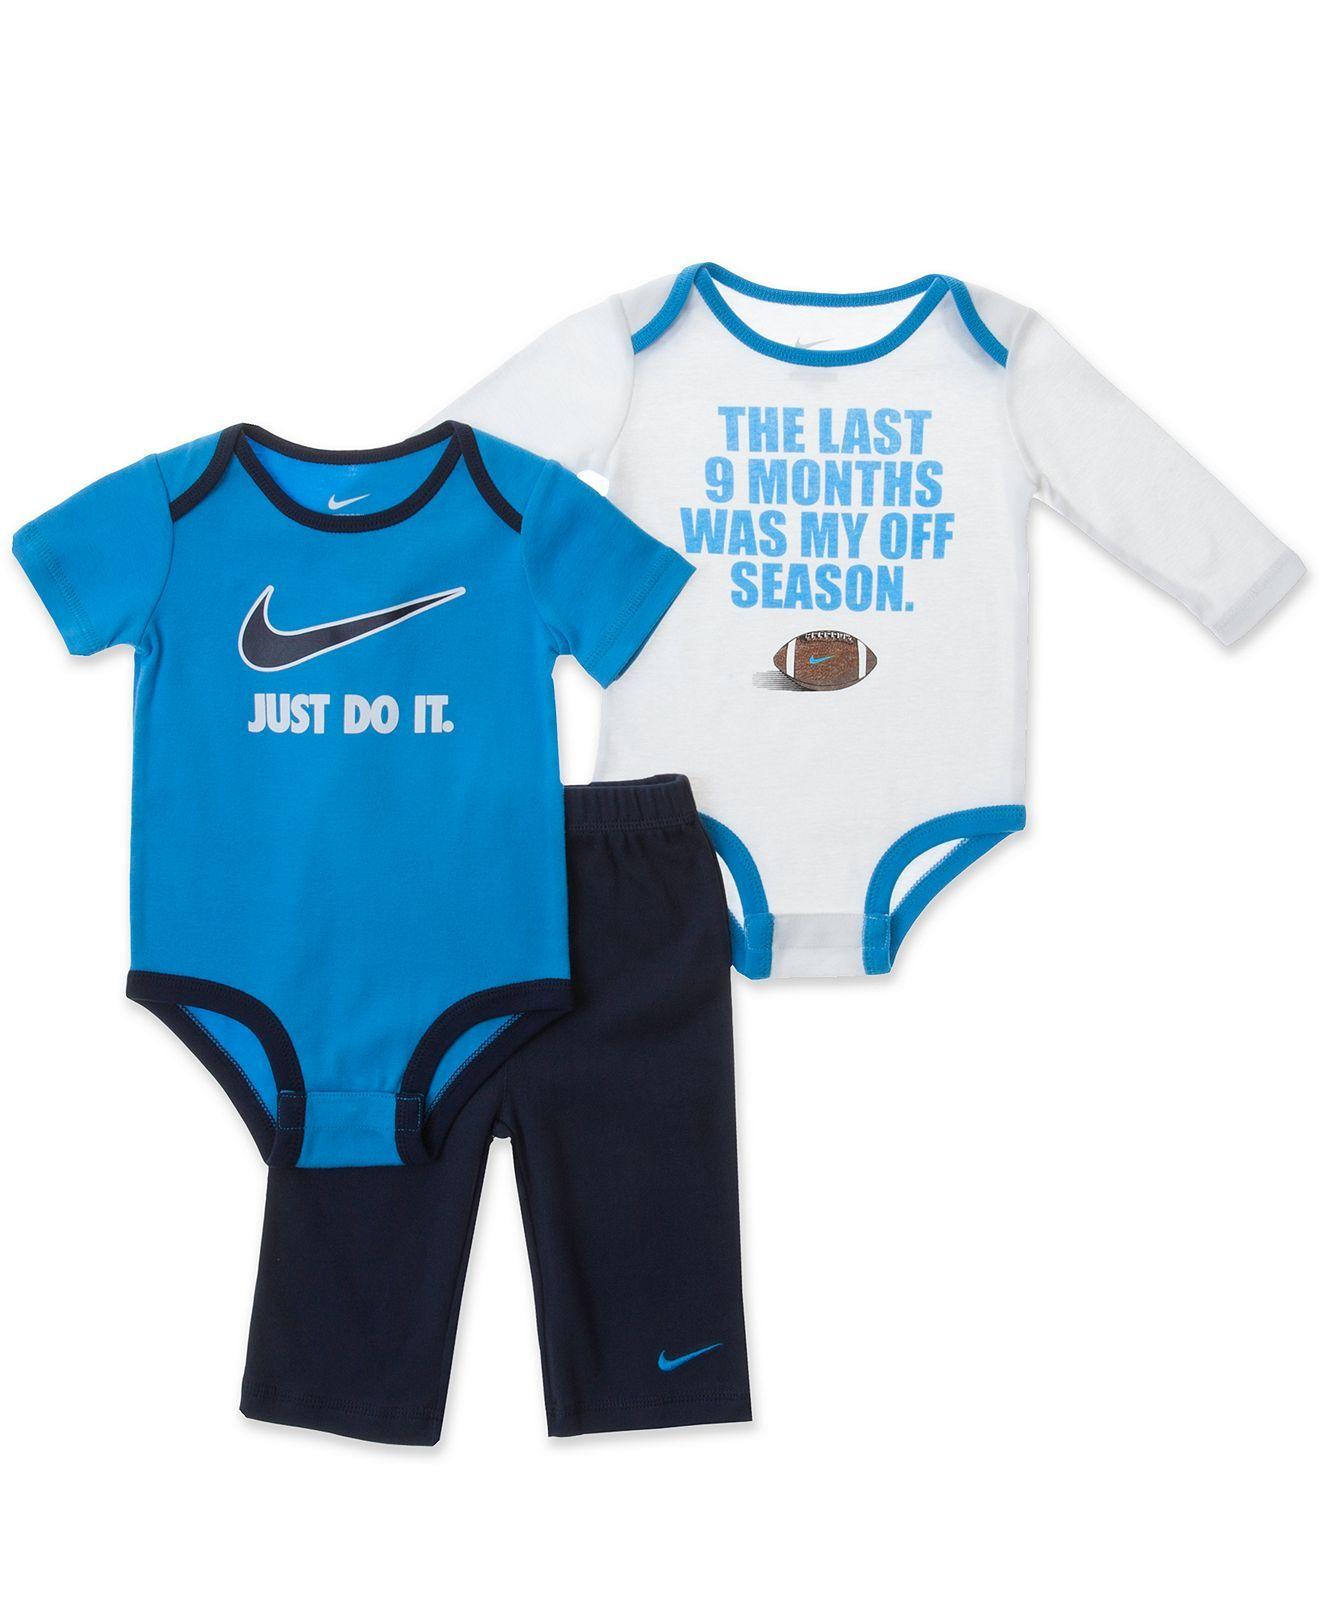 e0dd51871 Nike Baby Set, Baby Boys 3 Piece Bodysuit and Pant Set - Kids Shop All Baby  - Macy's